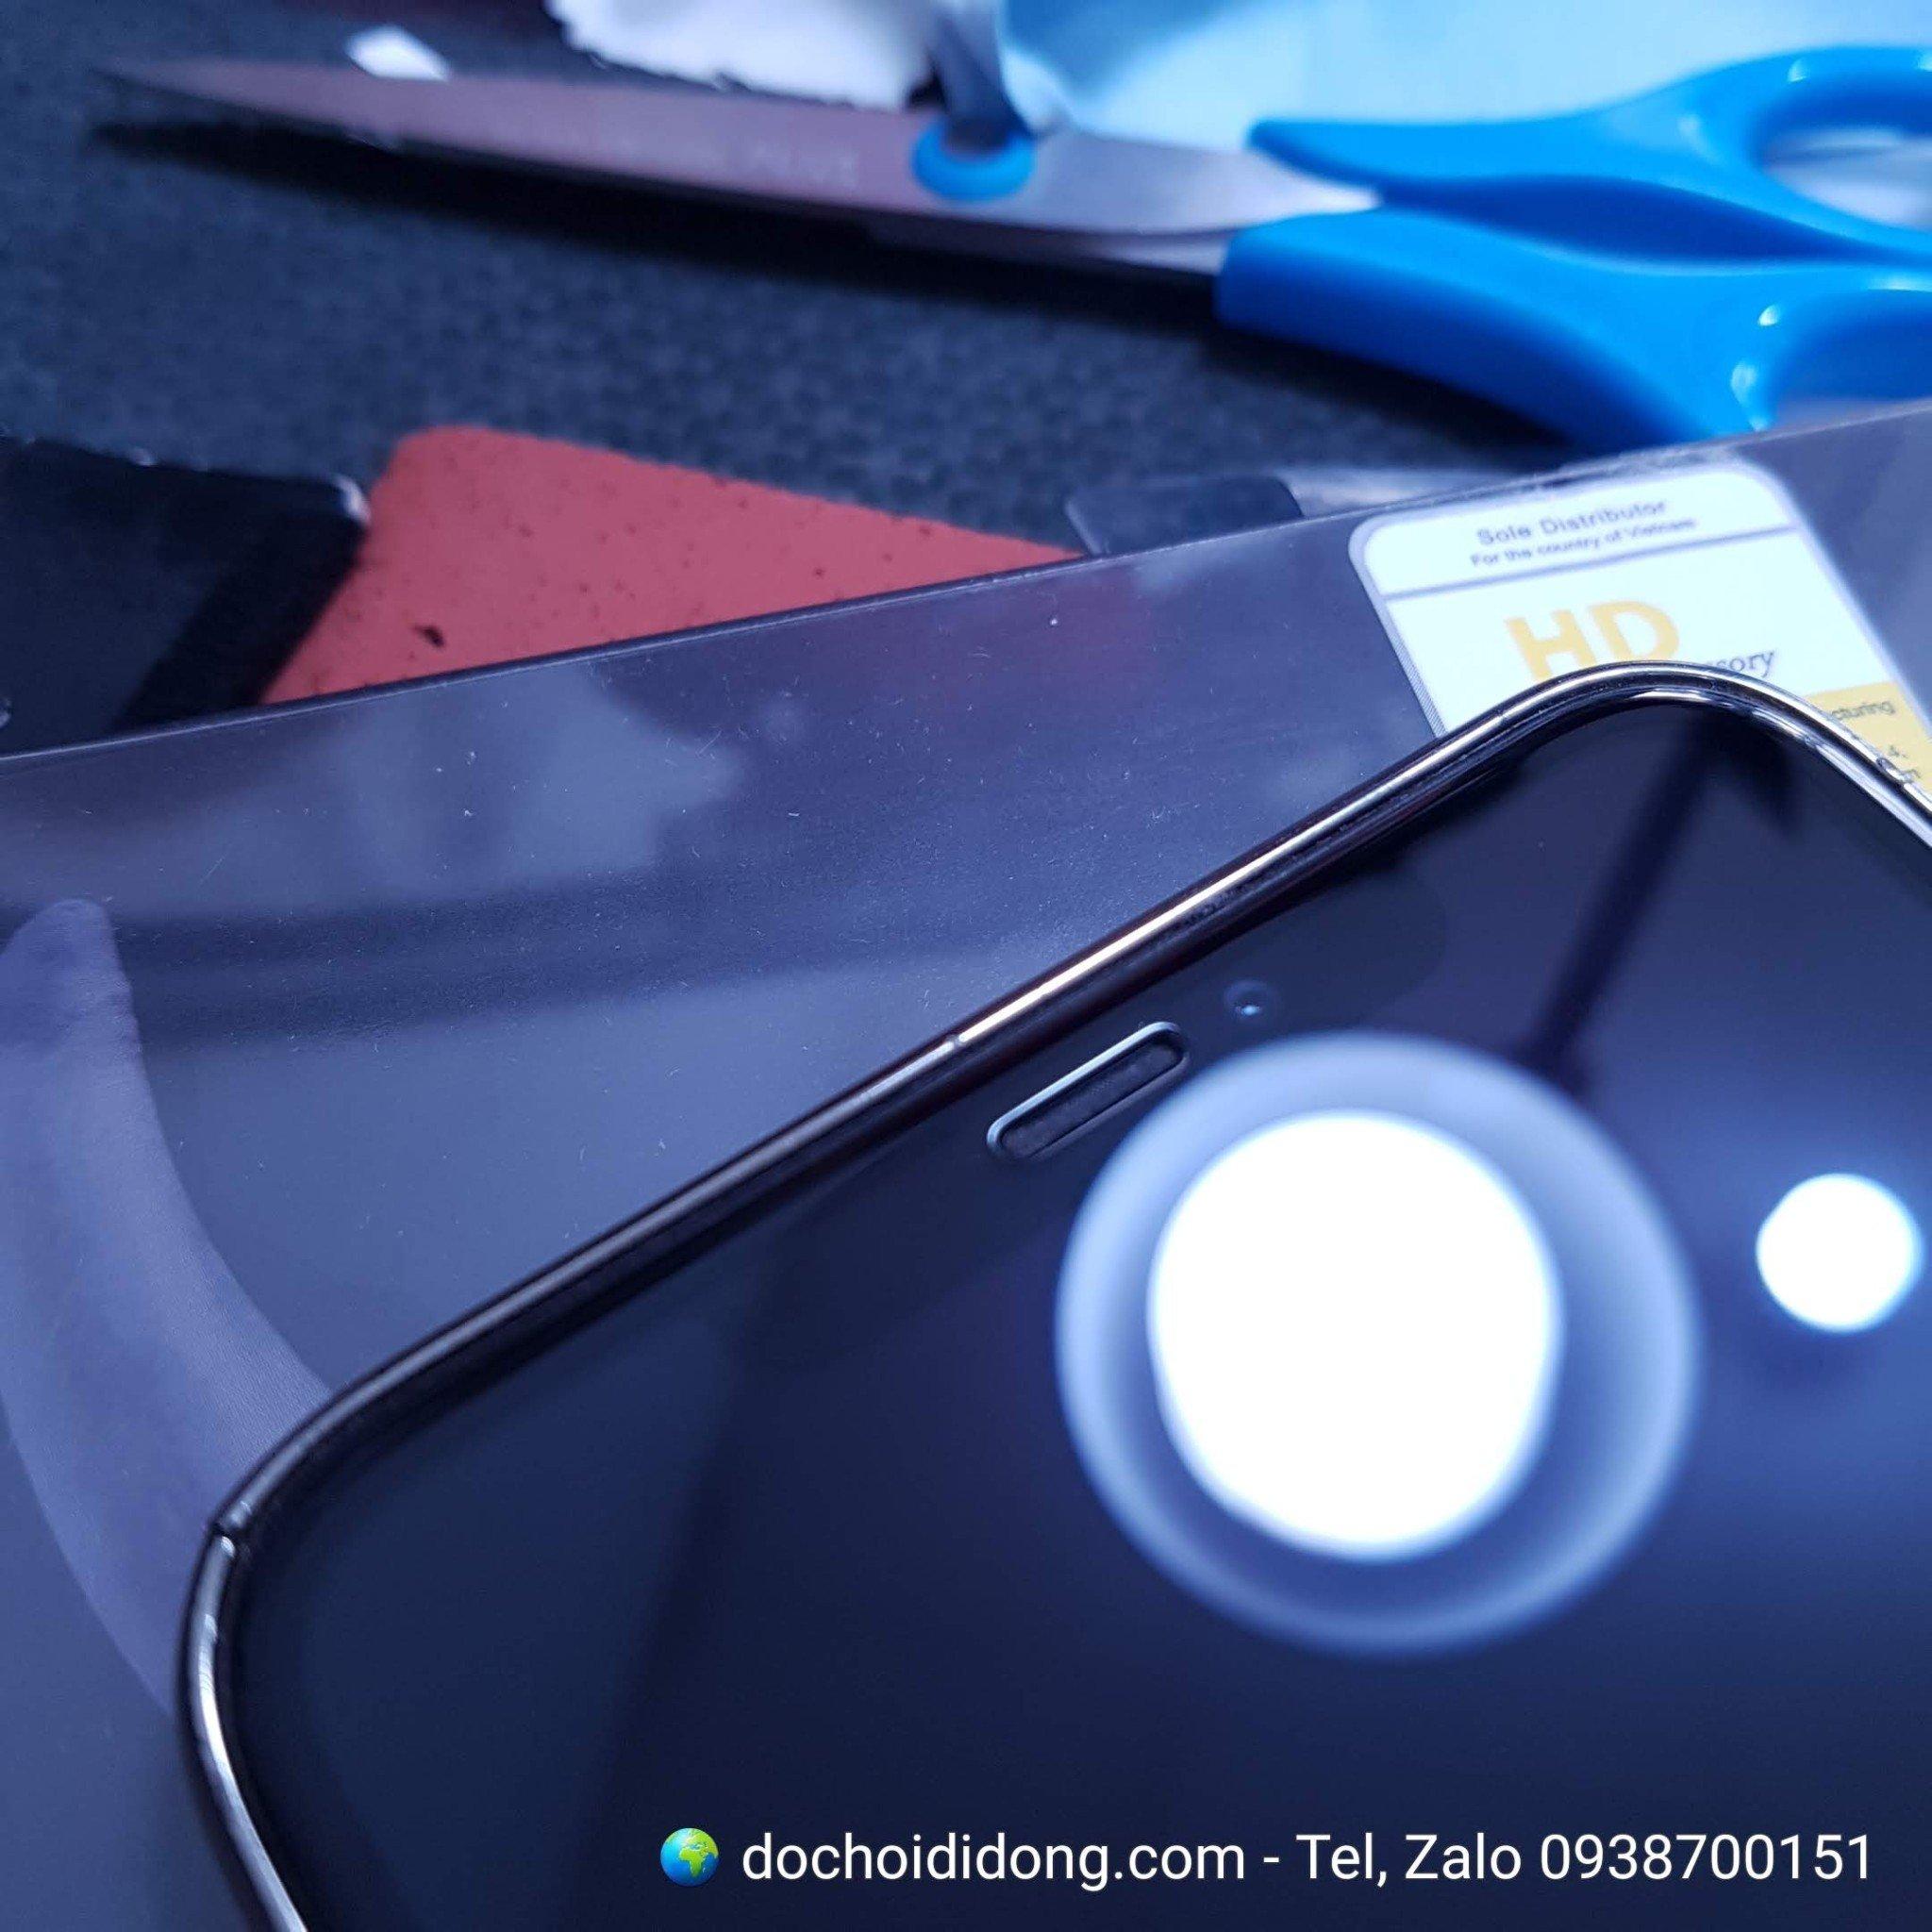 mieng-dan-cuong-luc-iphone-11-pro-max-mipow-king-bull-3d-full-man-hinh